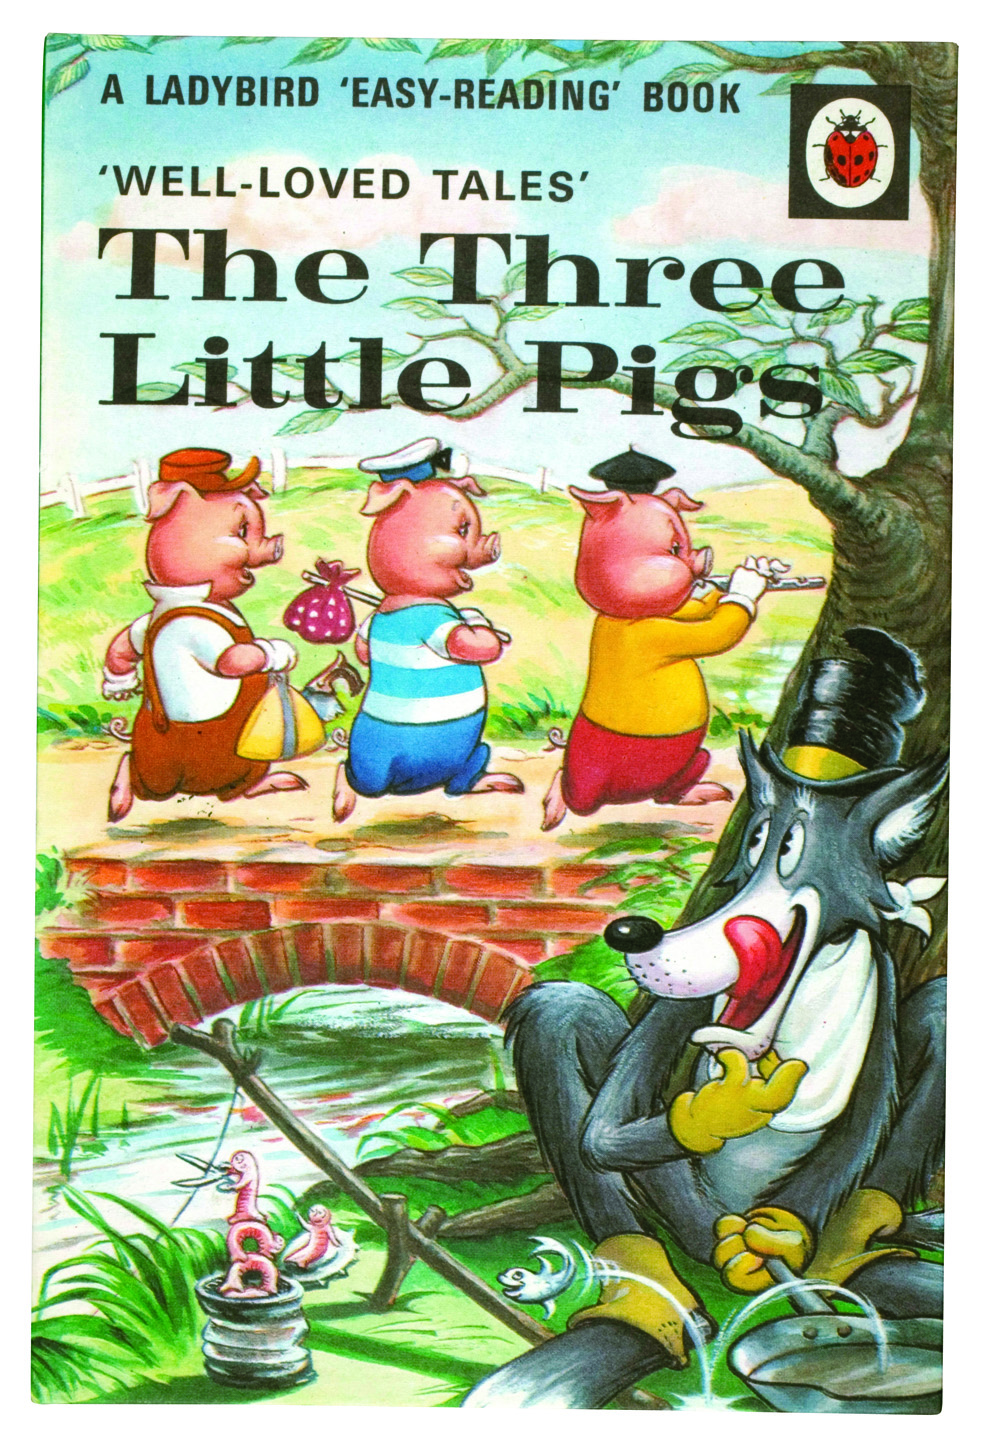 © Ladybird Books Ltd